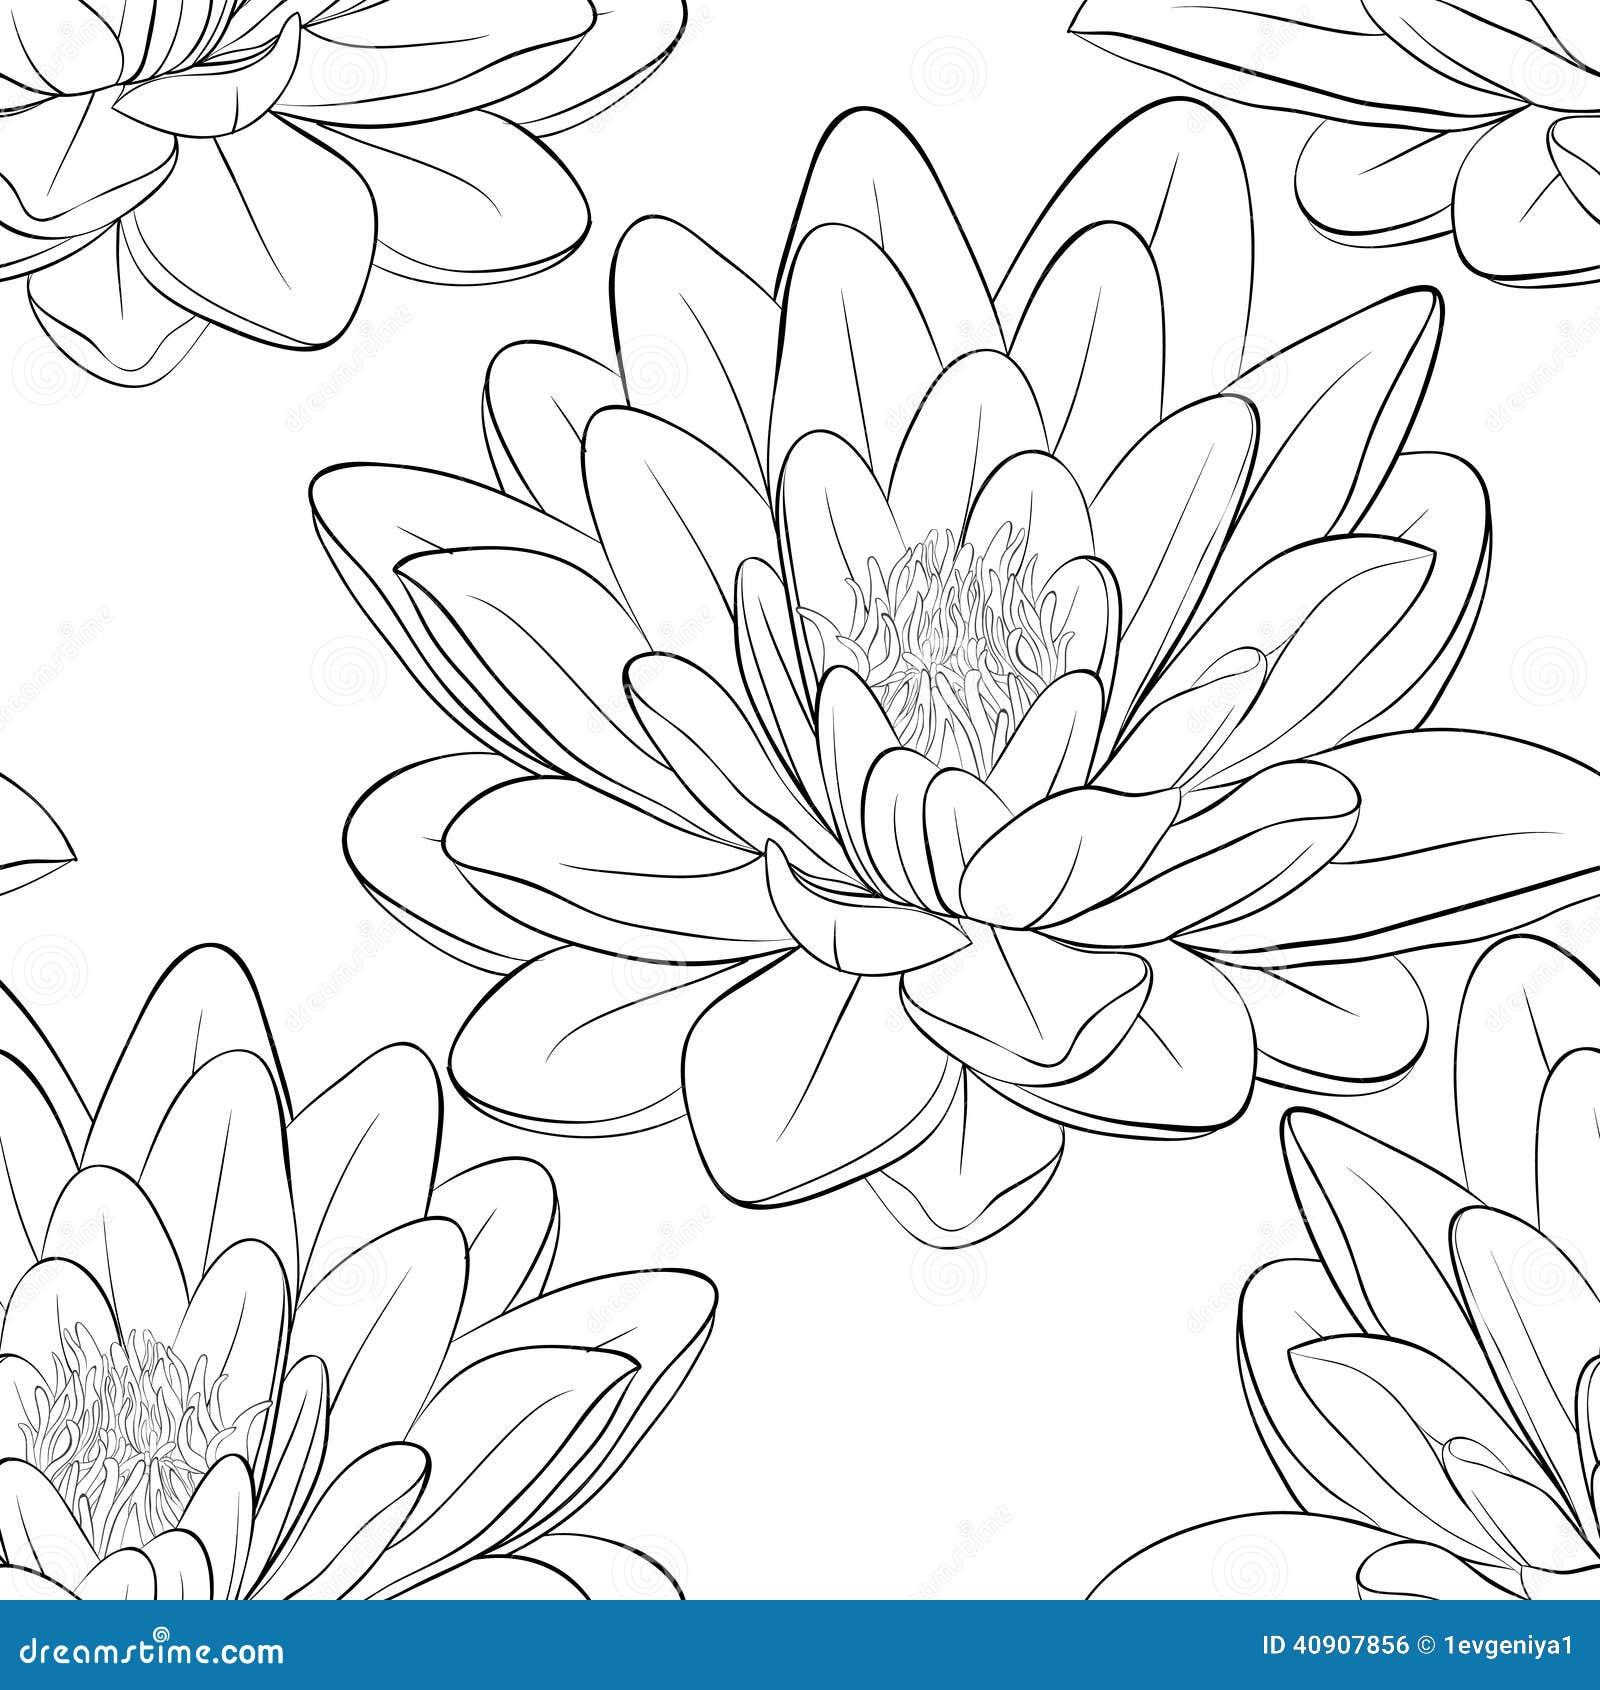 Japanese Flower Line Drawing : Beautiful monochrome black and white seamless pattern